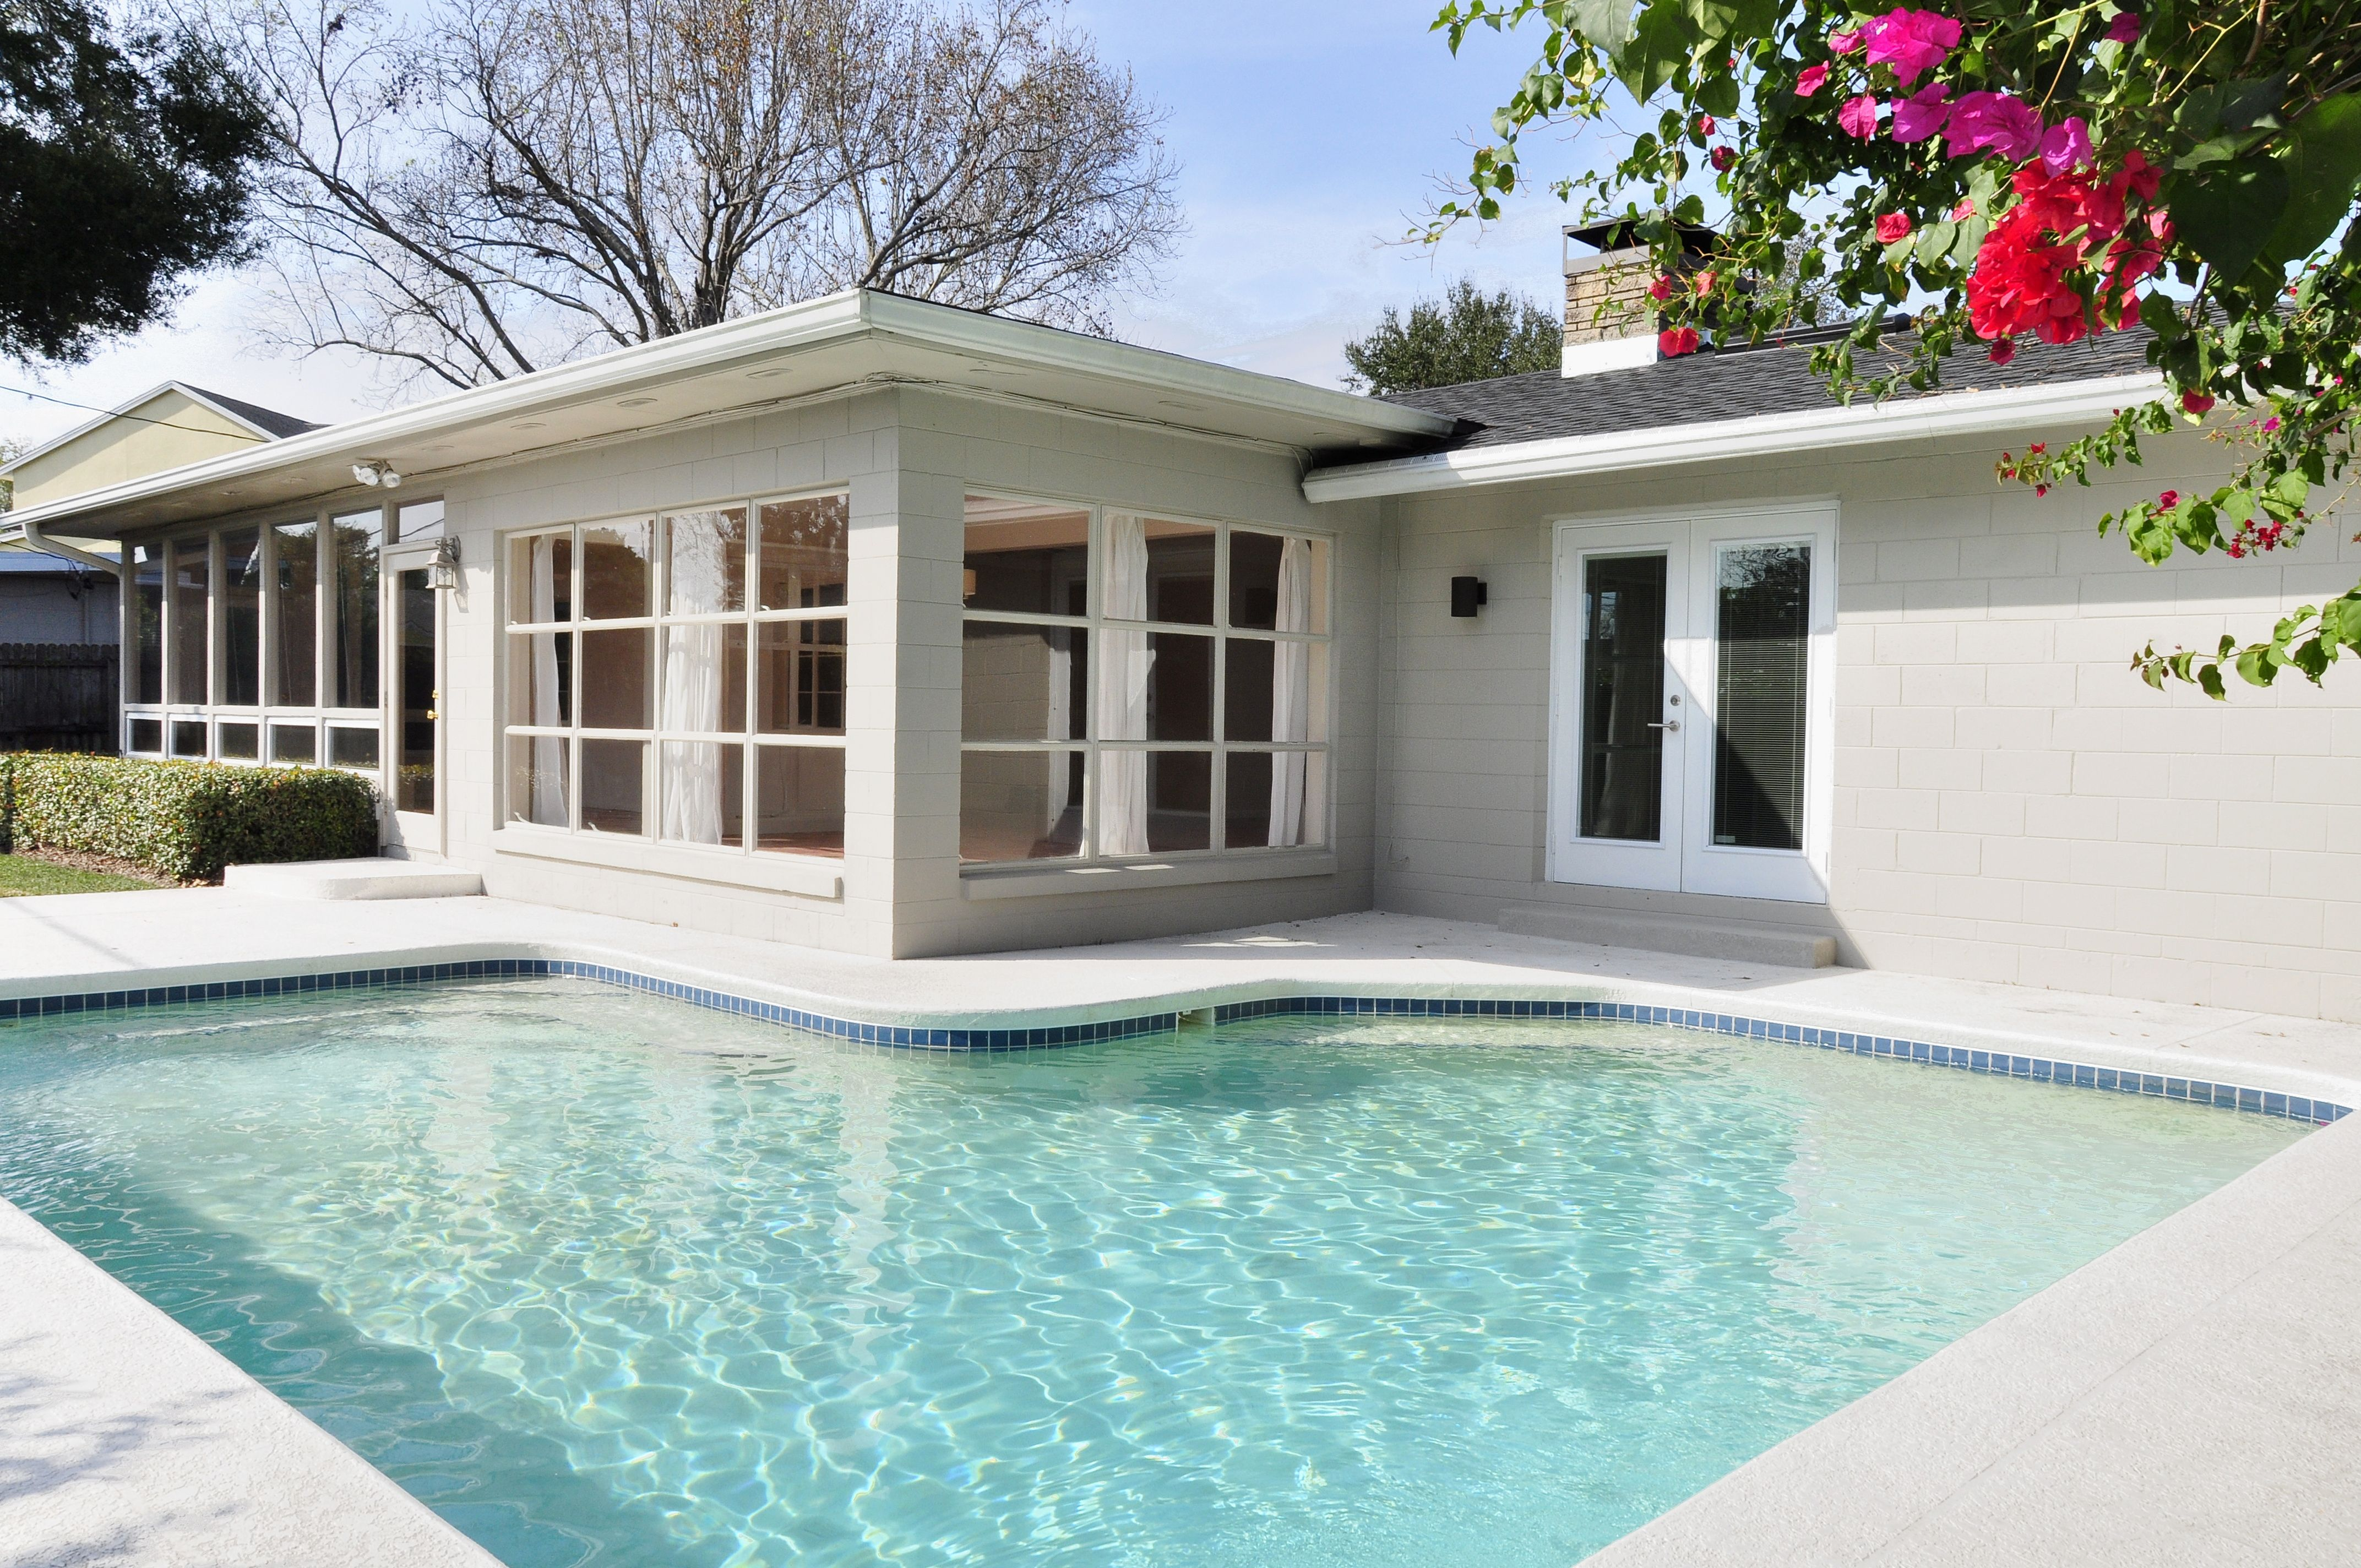 Enclosed Patio Sunroom With Big Windows Overlooking Custom Shape Pool By The Best Custom Home Builder Remodeler Patio Remodel Pool Patio Enclosed Patio